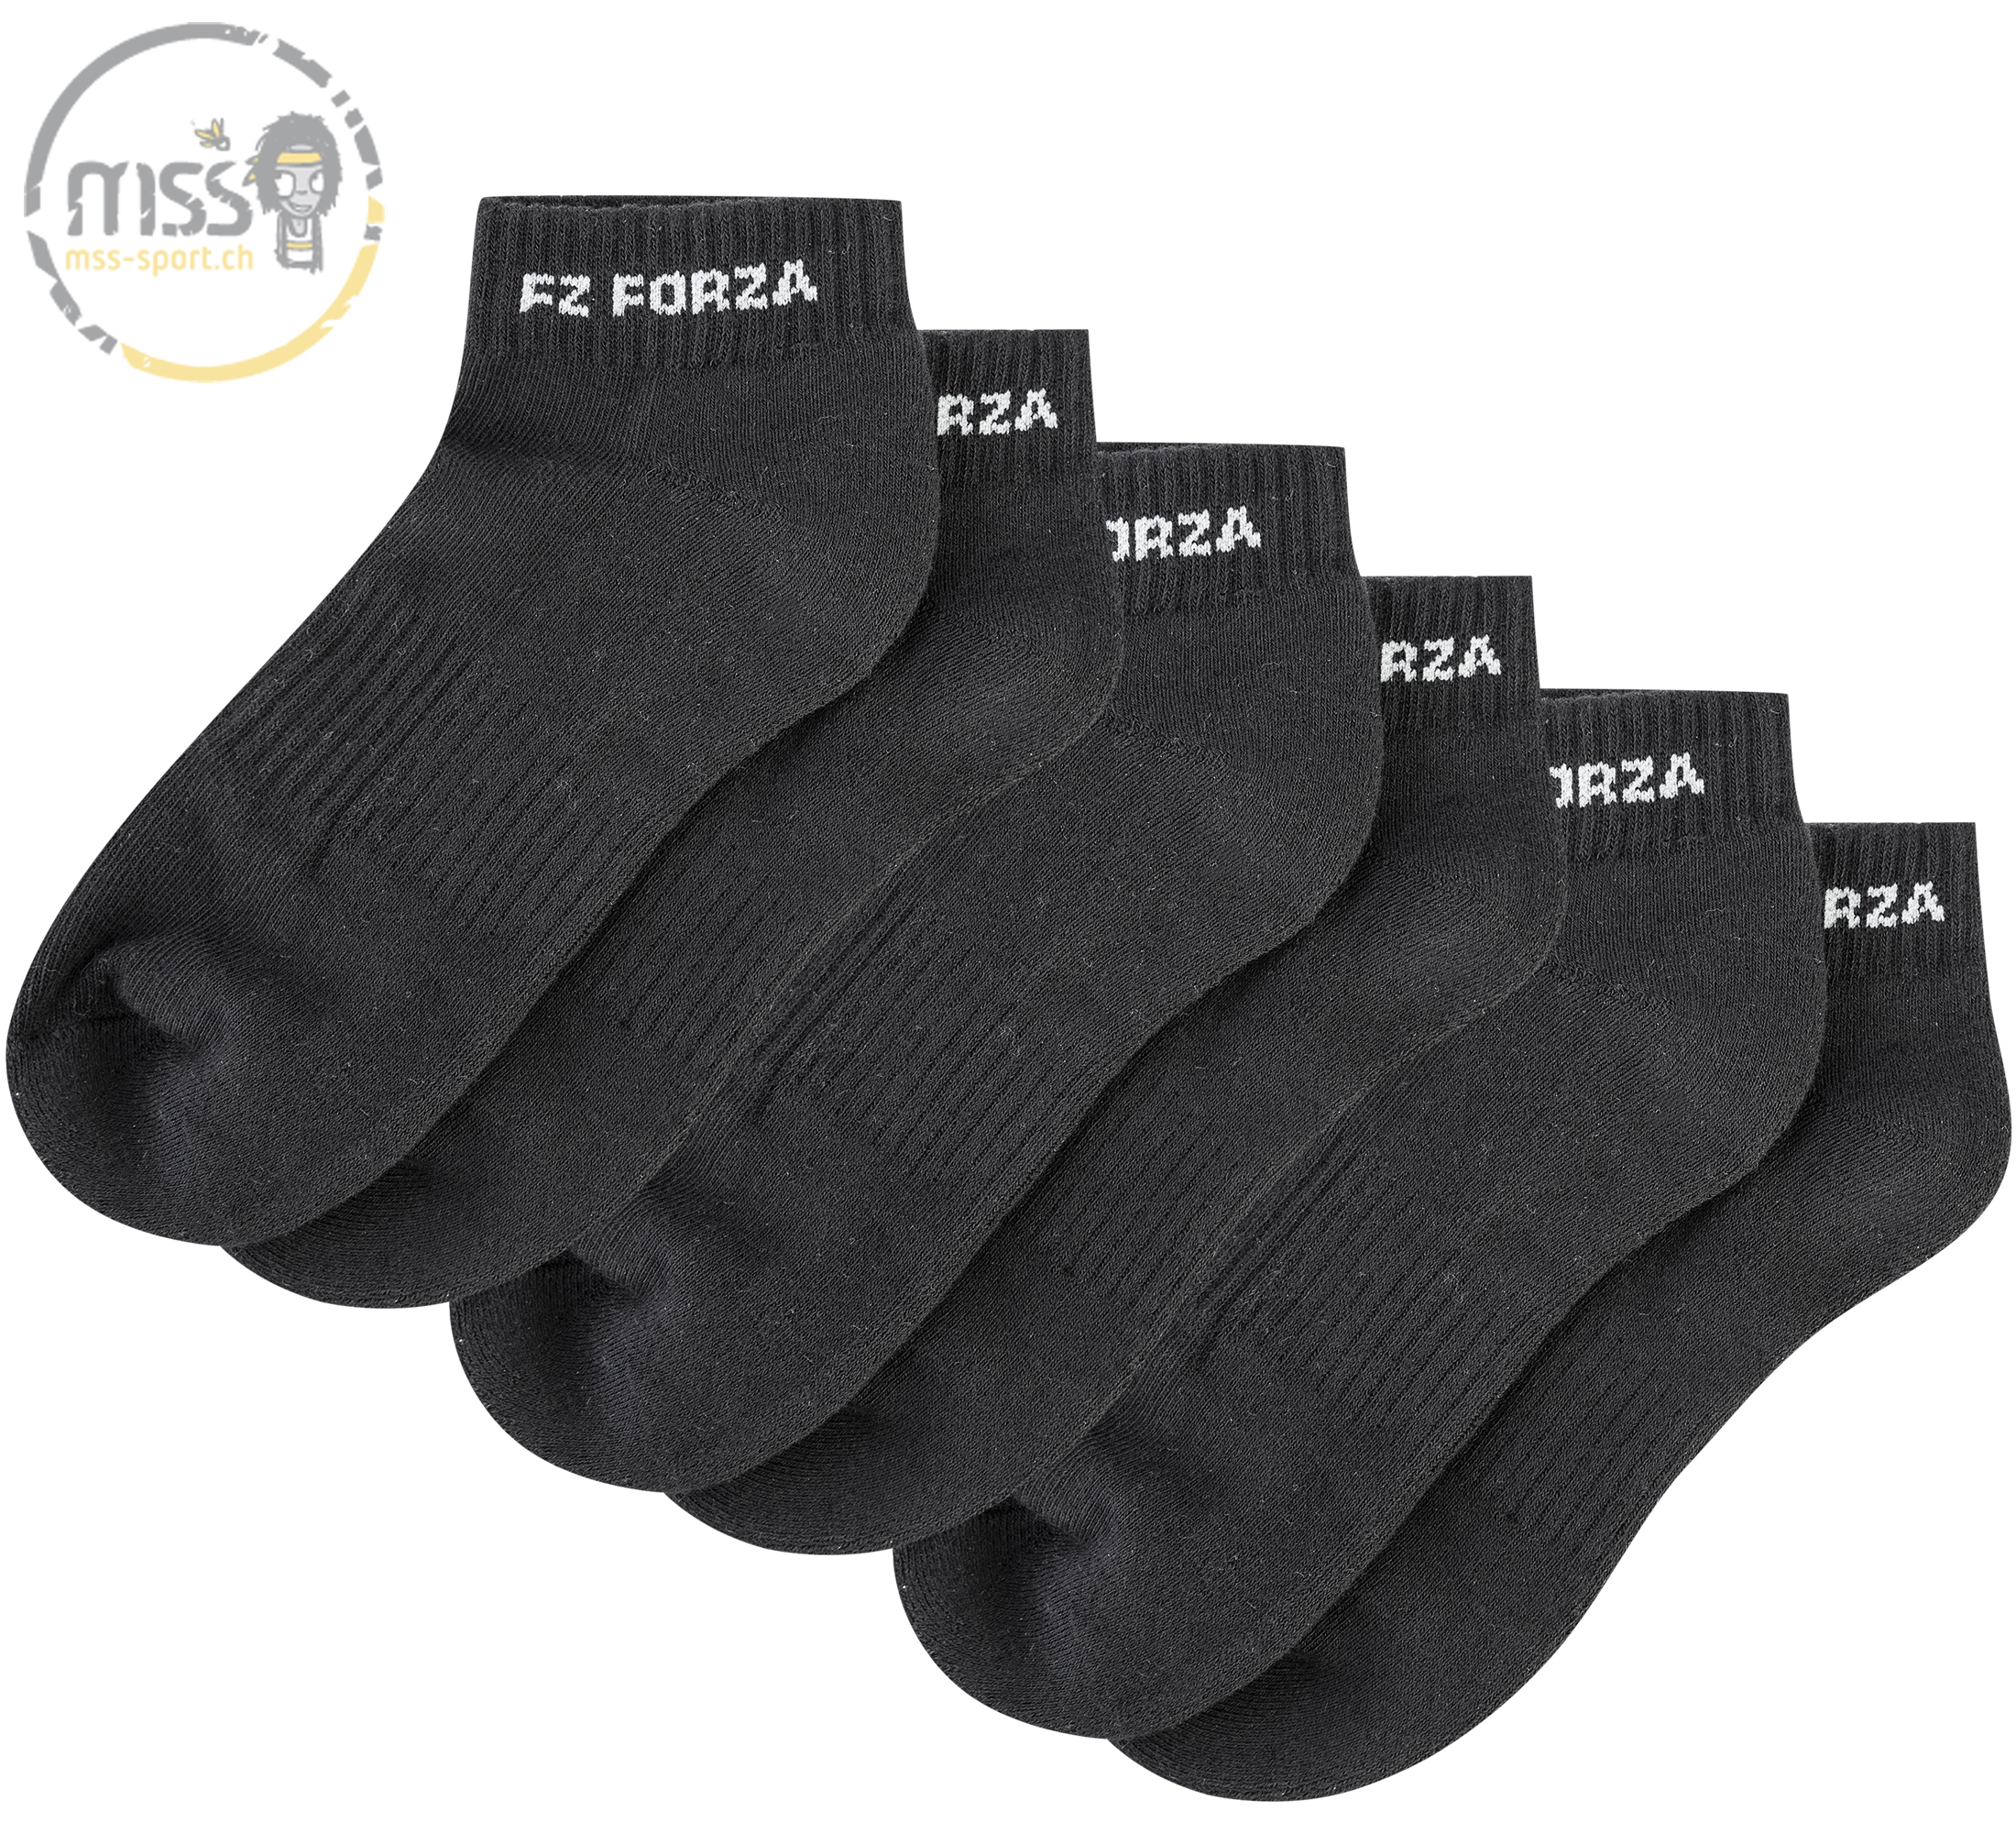 Forza Sock Comfort long black 3pack